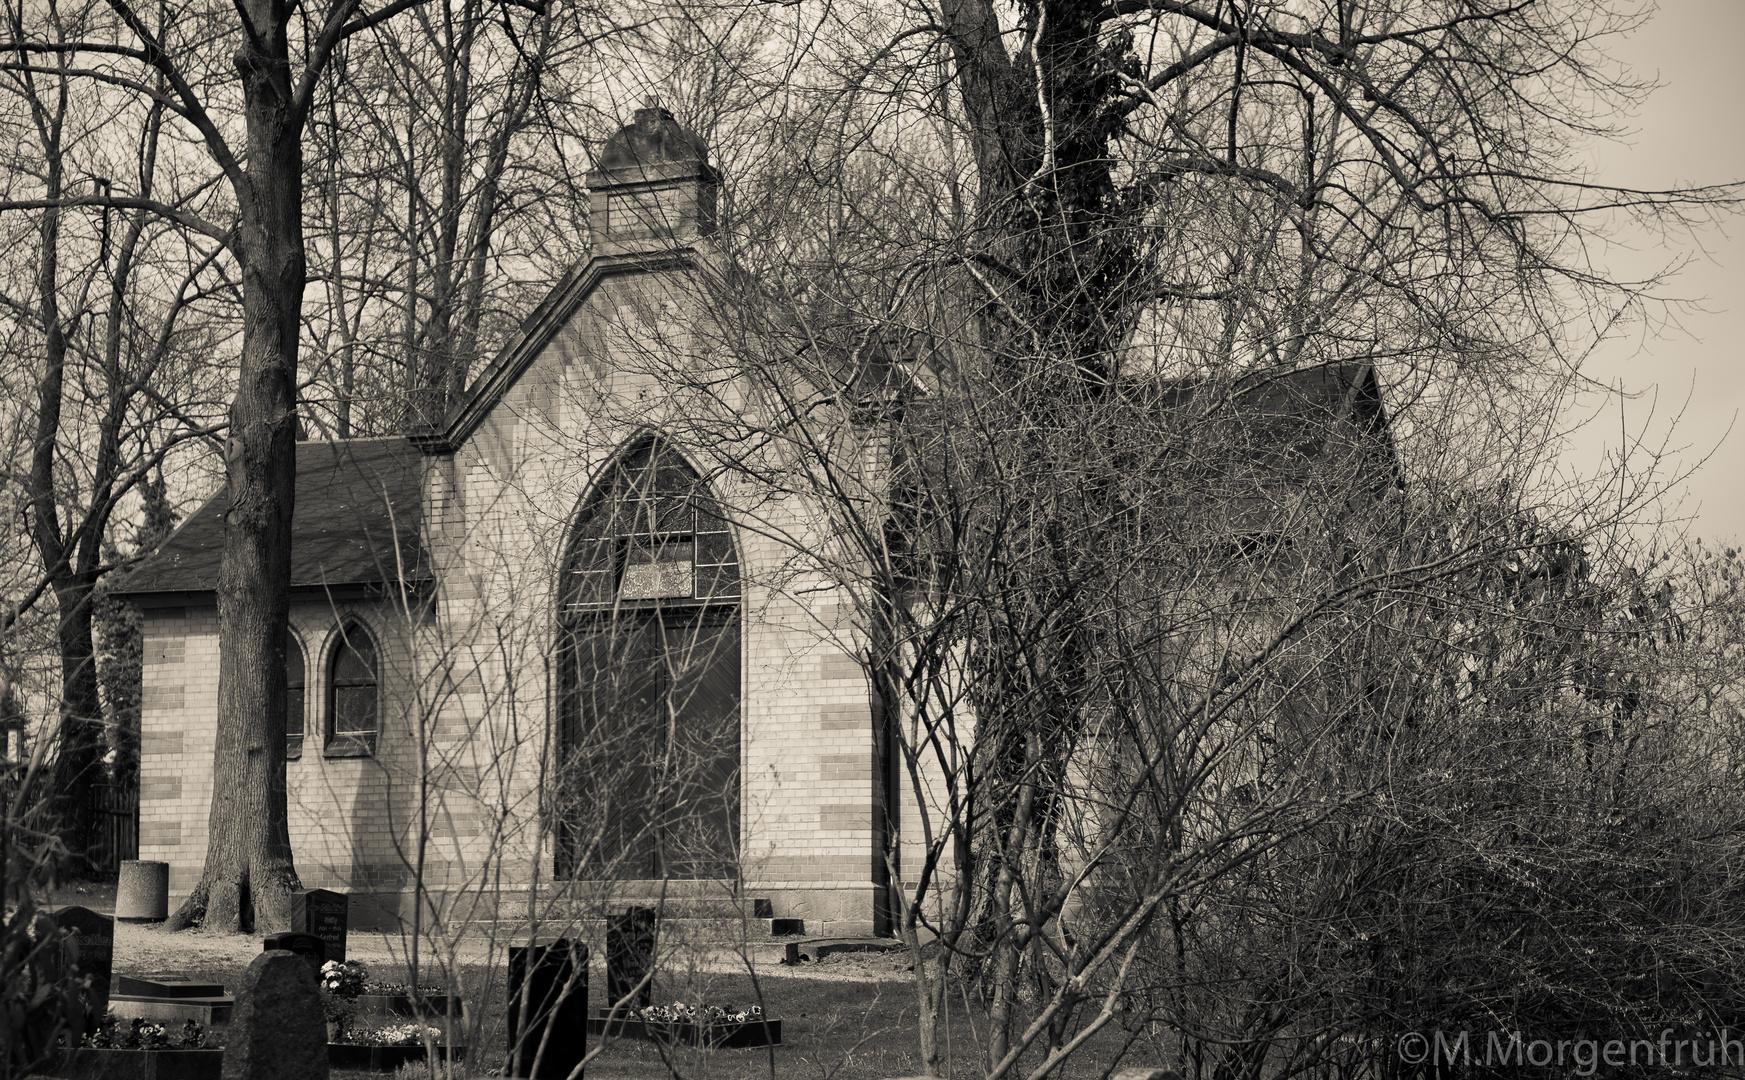 Totenhalle